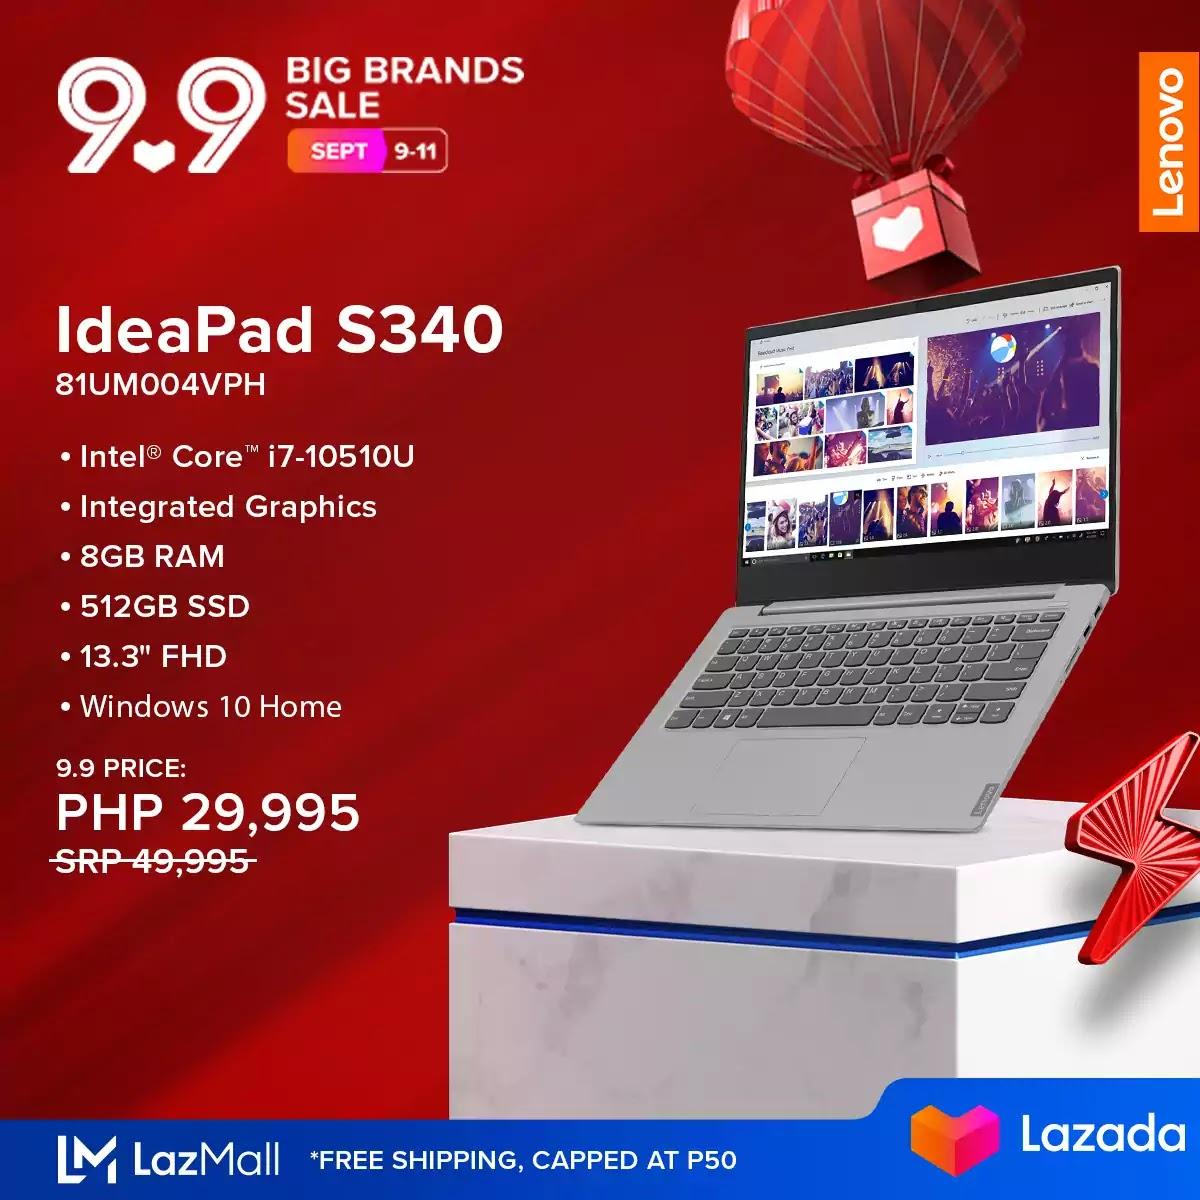 IdeaPad S340 81UM004VPH